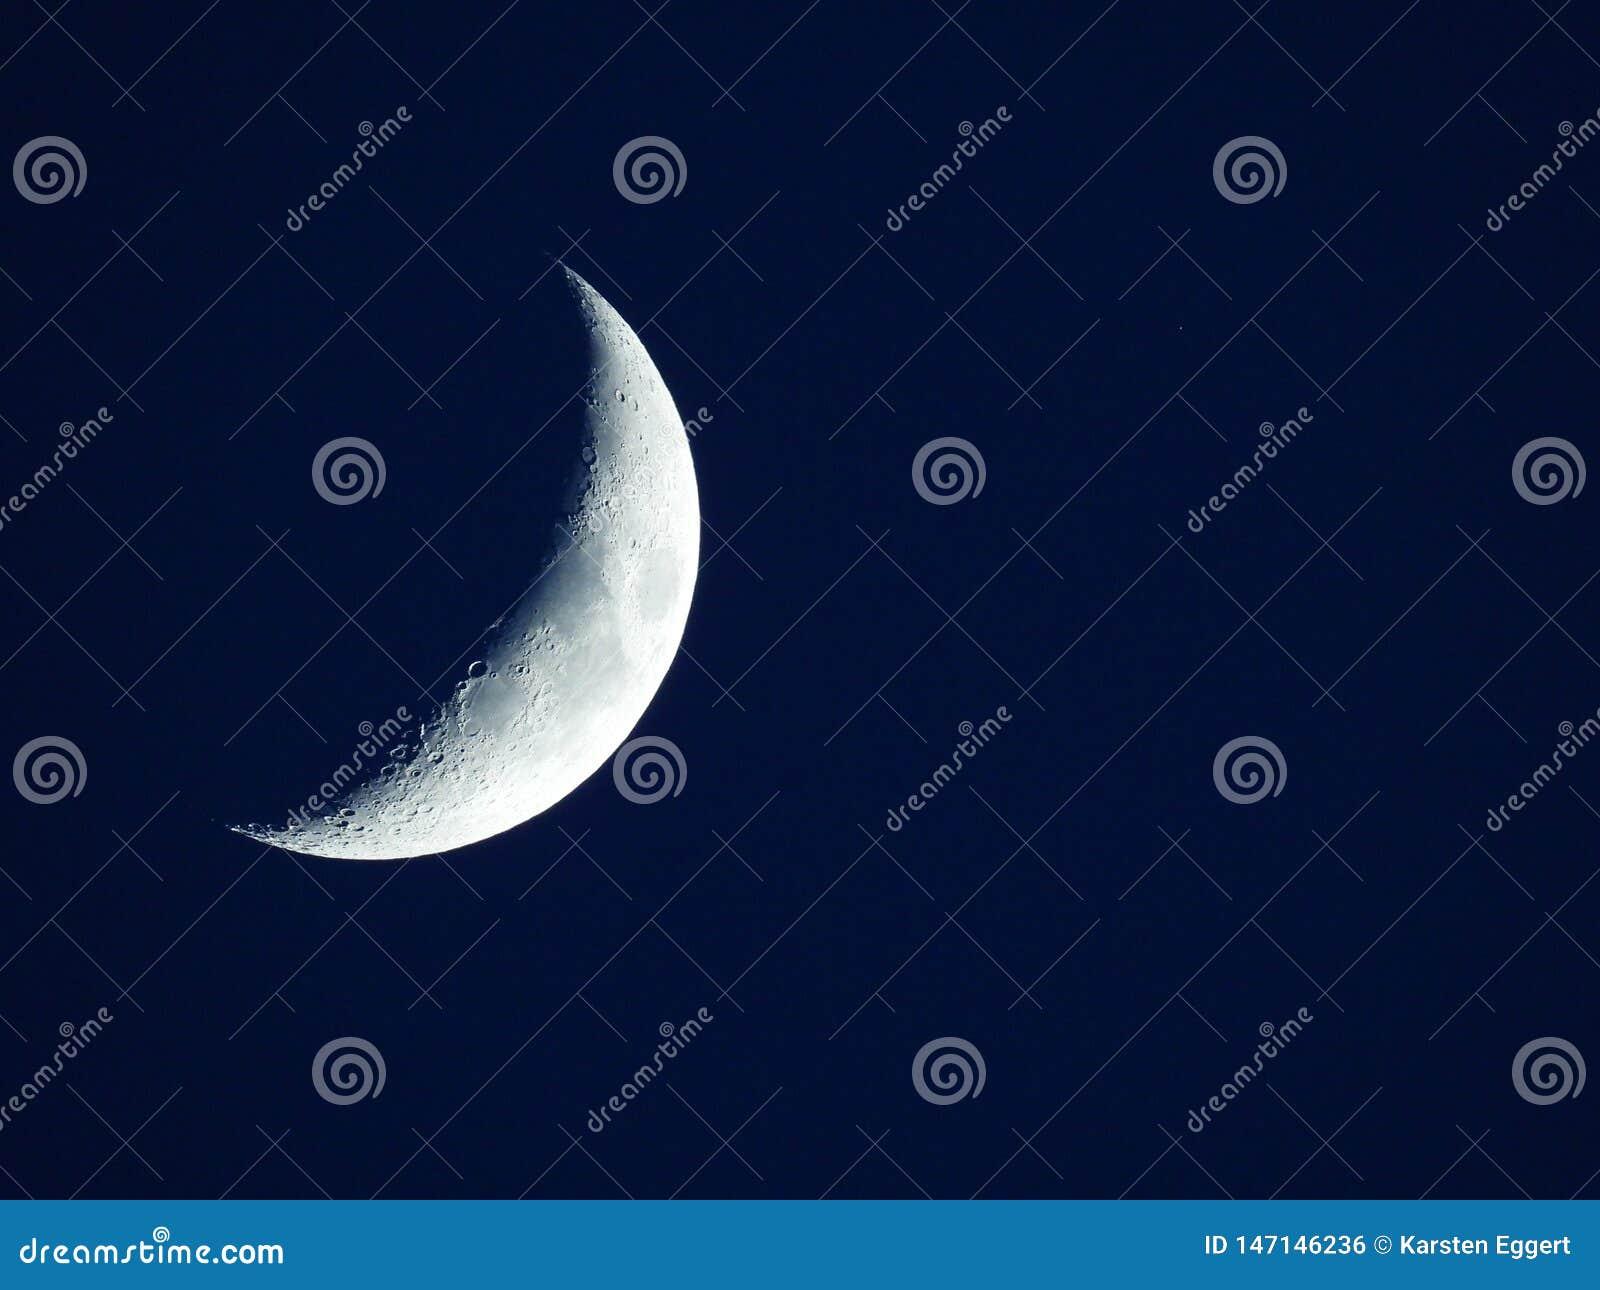 Rising quarter moon in the dark blue evening sky